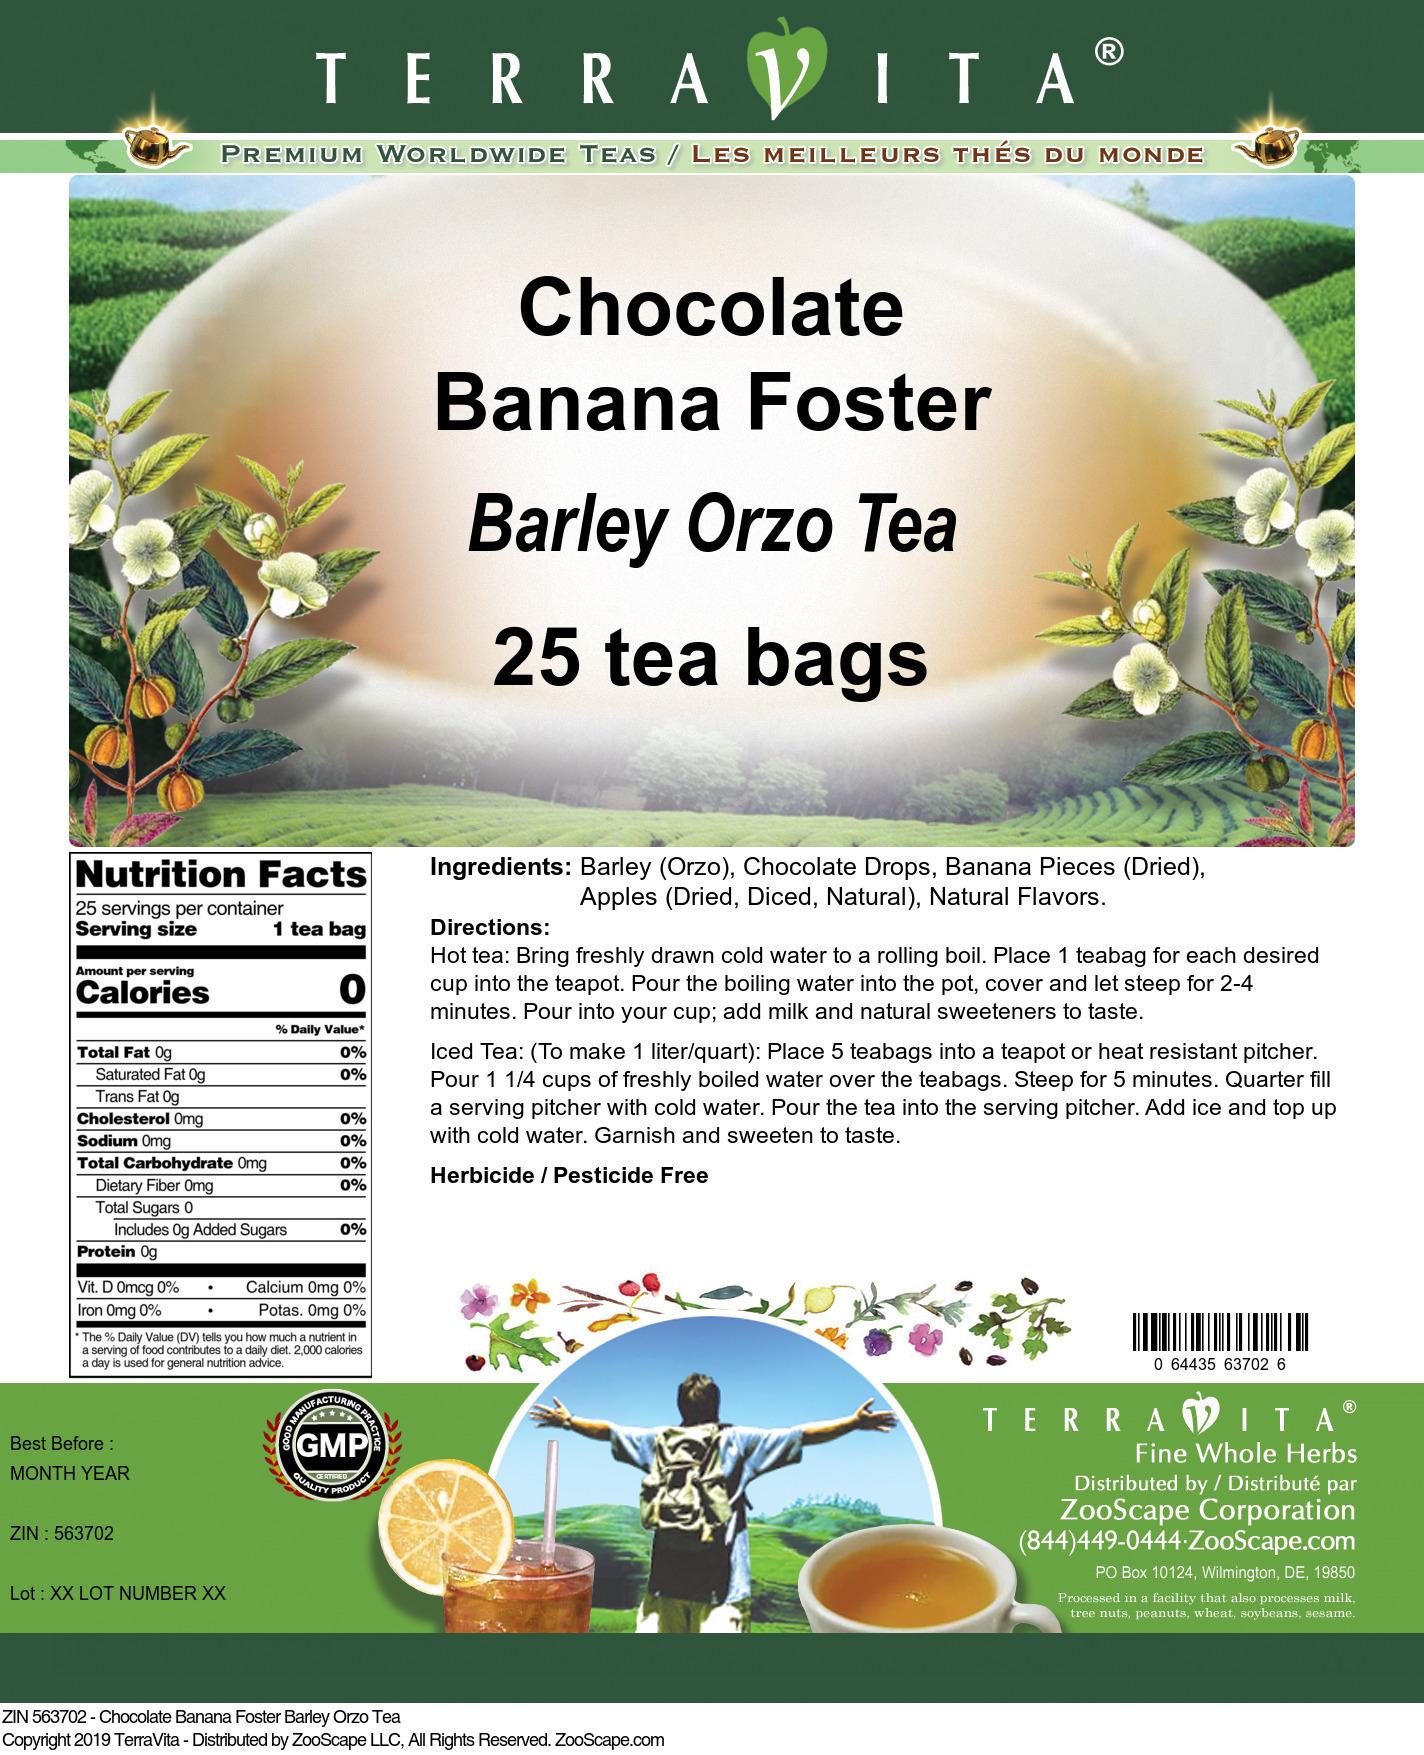 Chocolate Banana Foster Barley Orzo